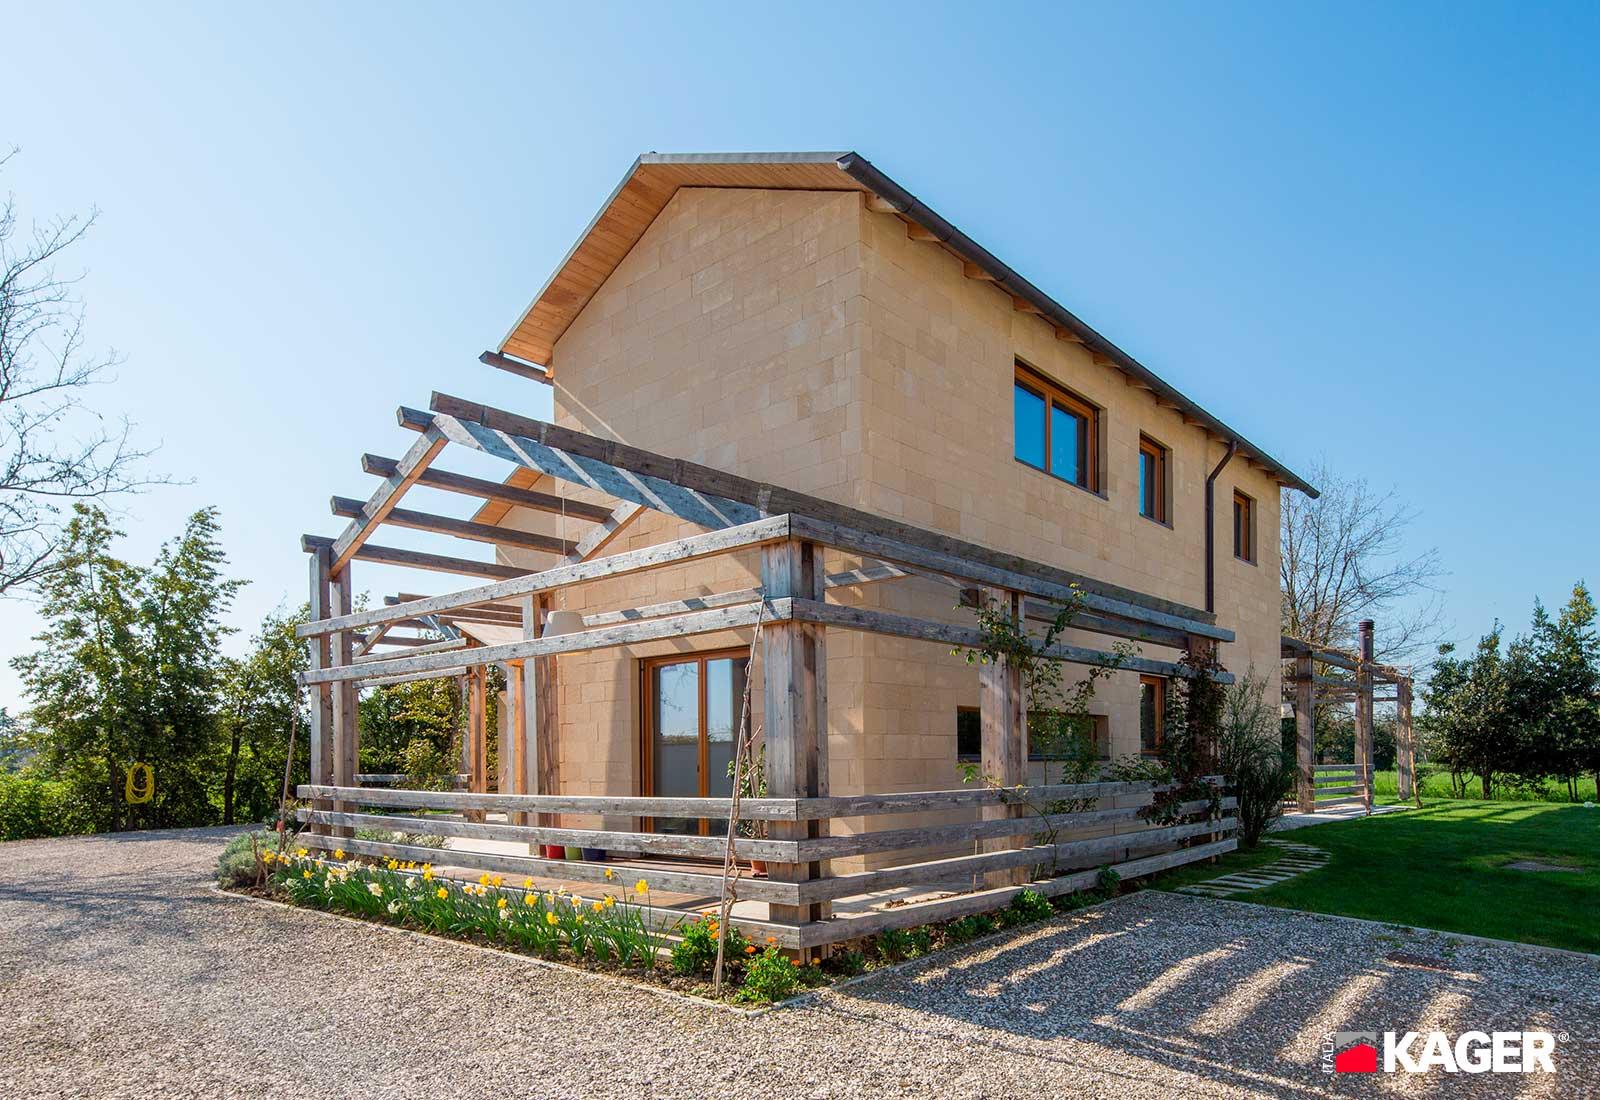 Casa-in-legno-Forli-Kager-Italia-01